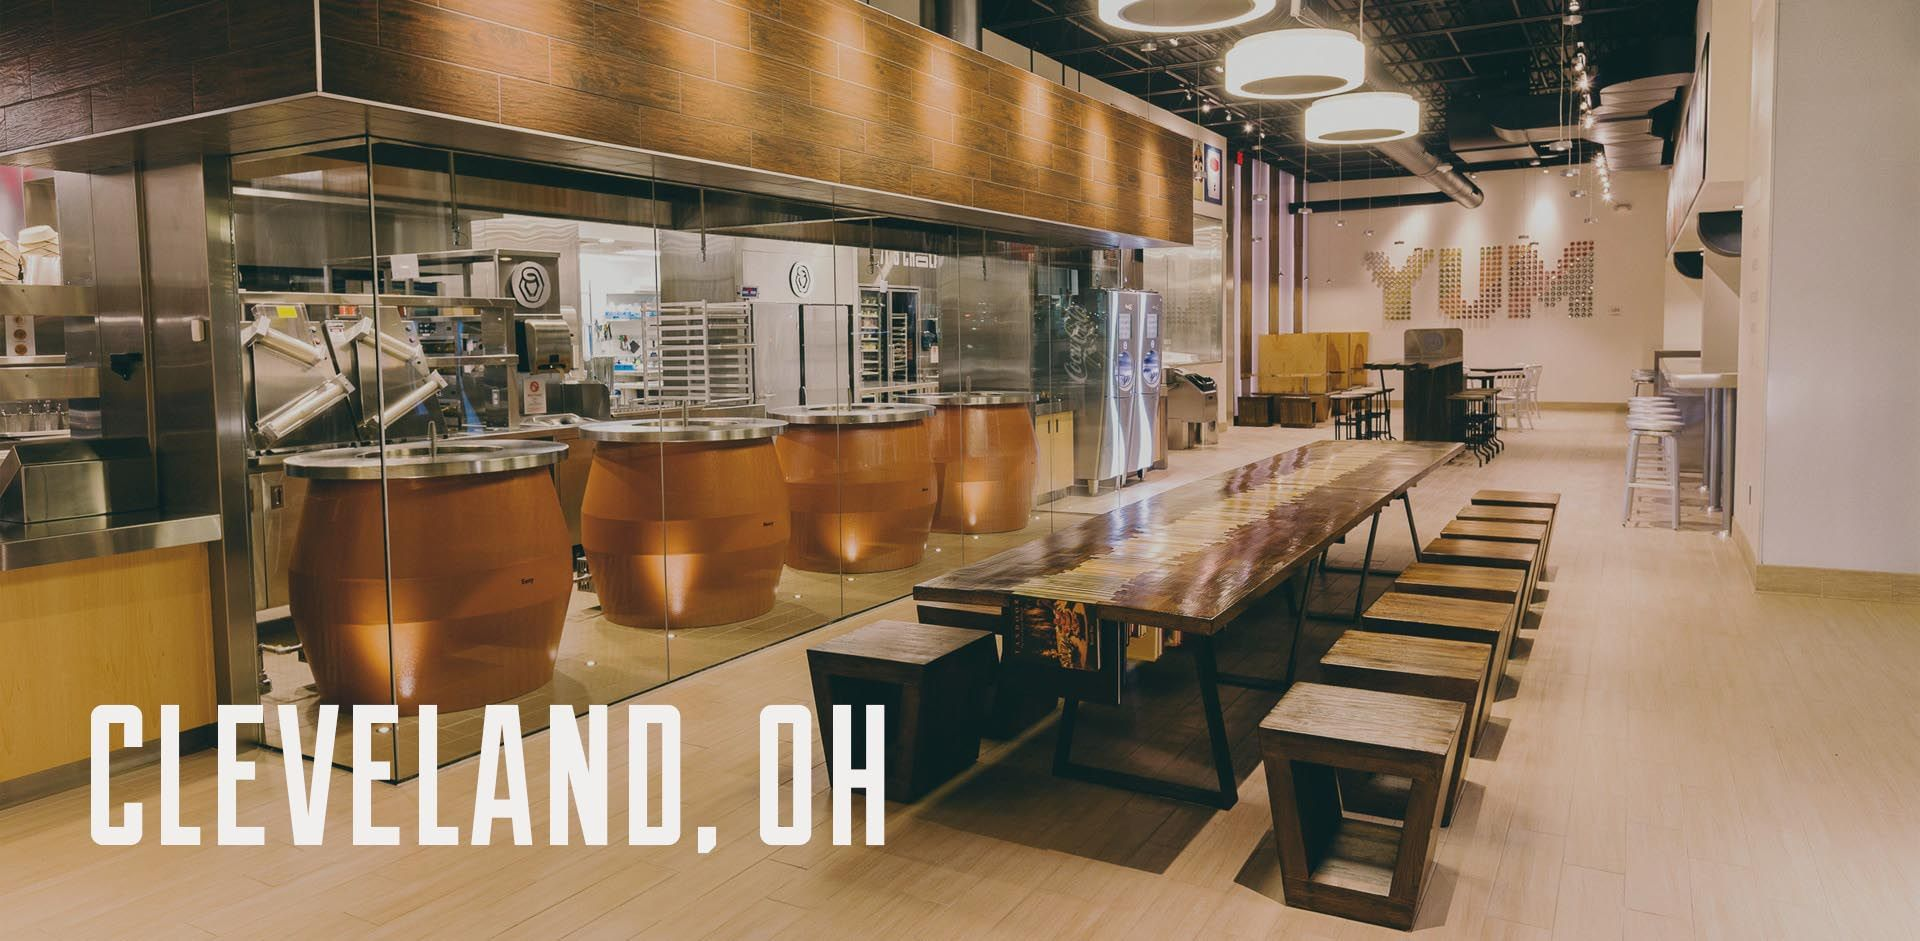 Choolaah Indian Bbq Restaurant Bbq Restaurant Amish Country Restaurant Concept